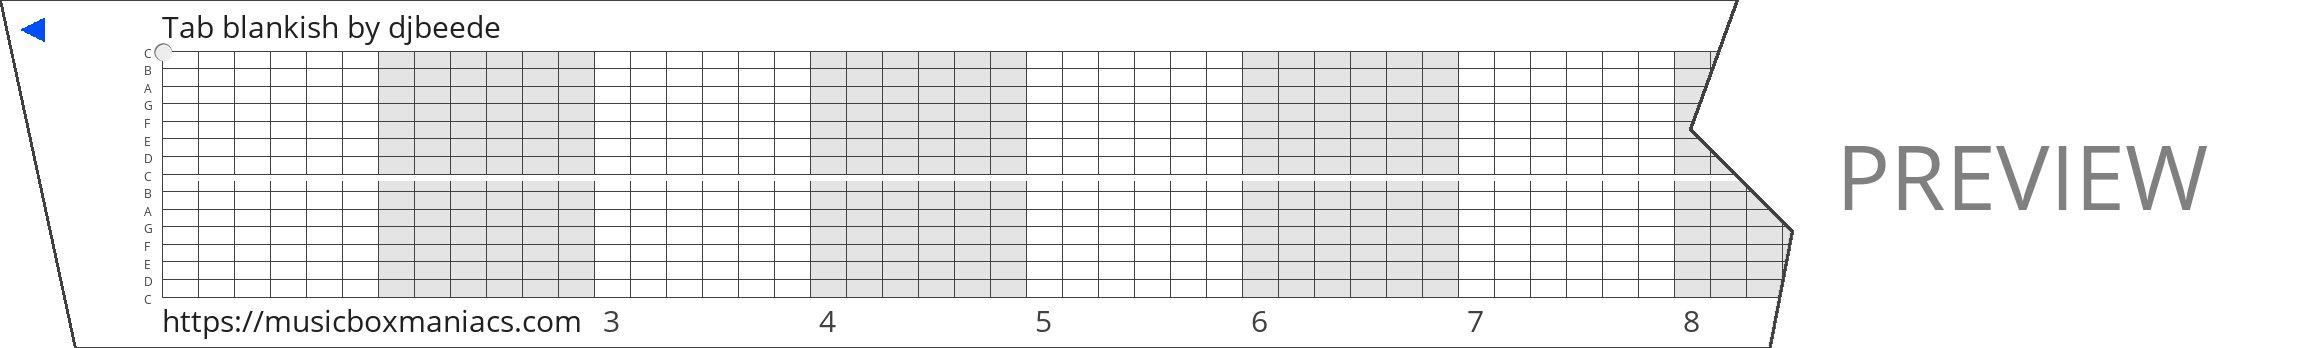 Tab blankish 15 note music box paper strip